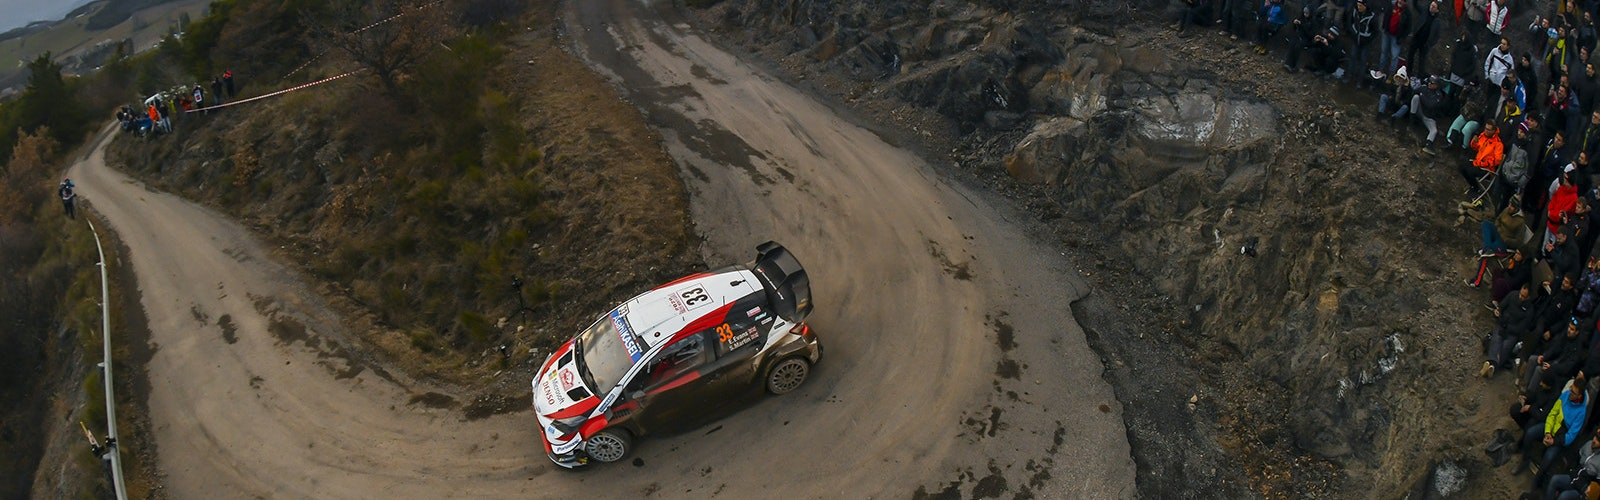 Elfyn Evans Toyota Monte Carlo Rally 2020